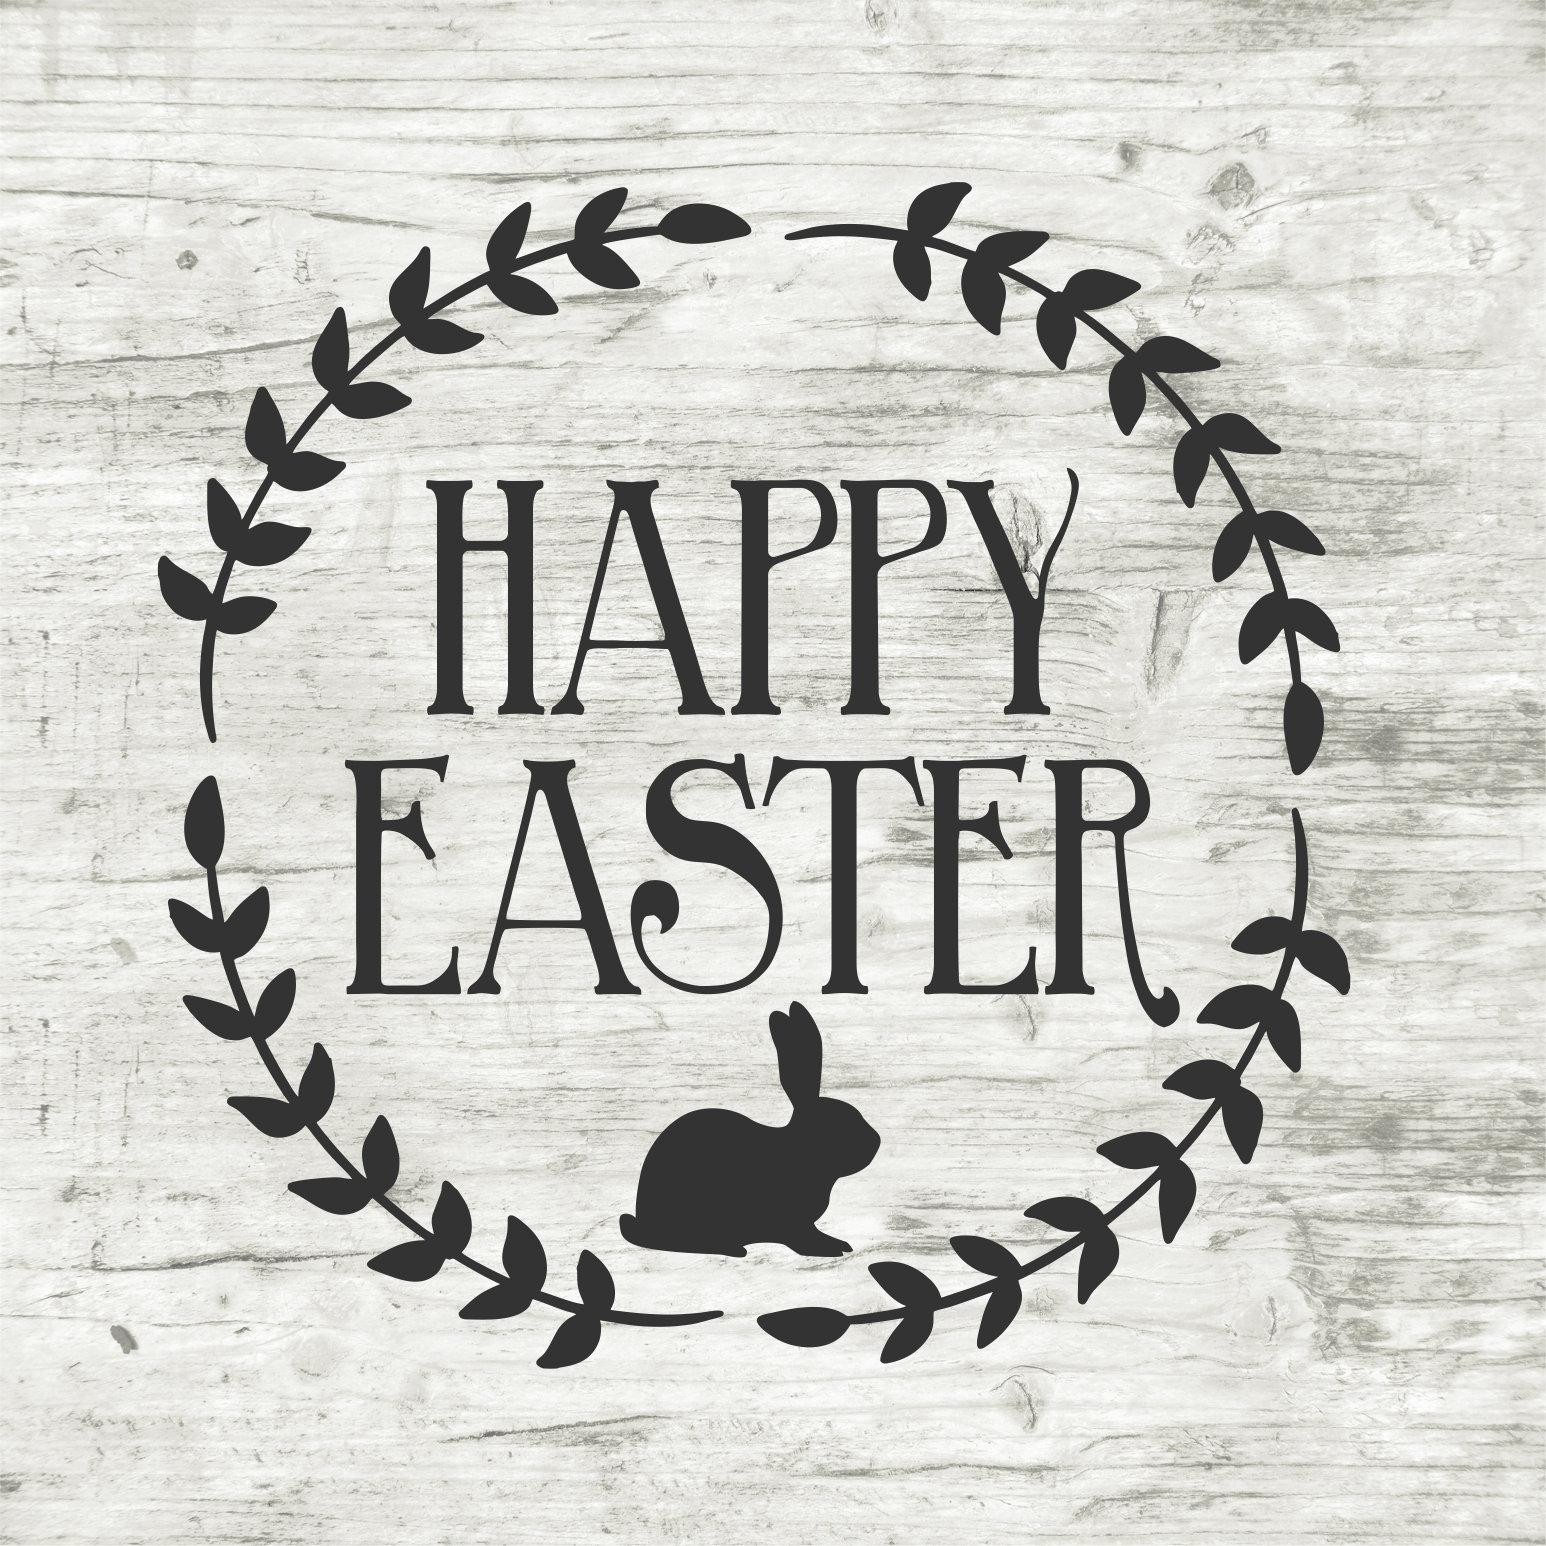 Happy Easter Stencil Easter Stencil Wreath Stencil Easter ...